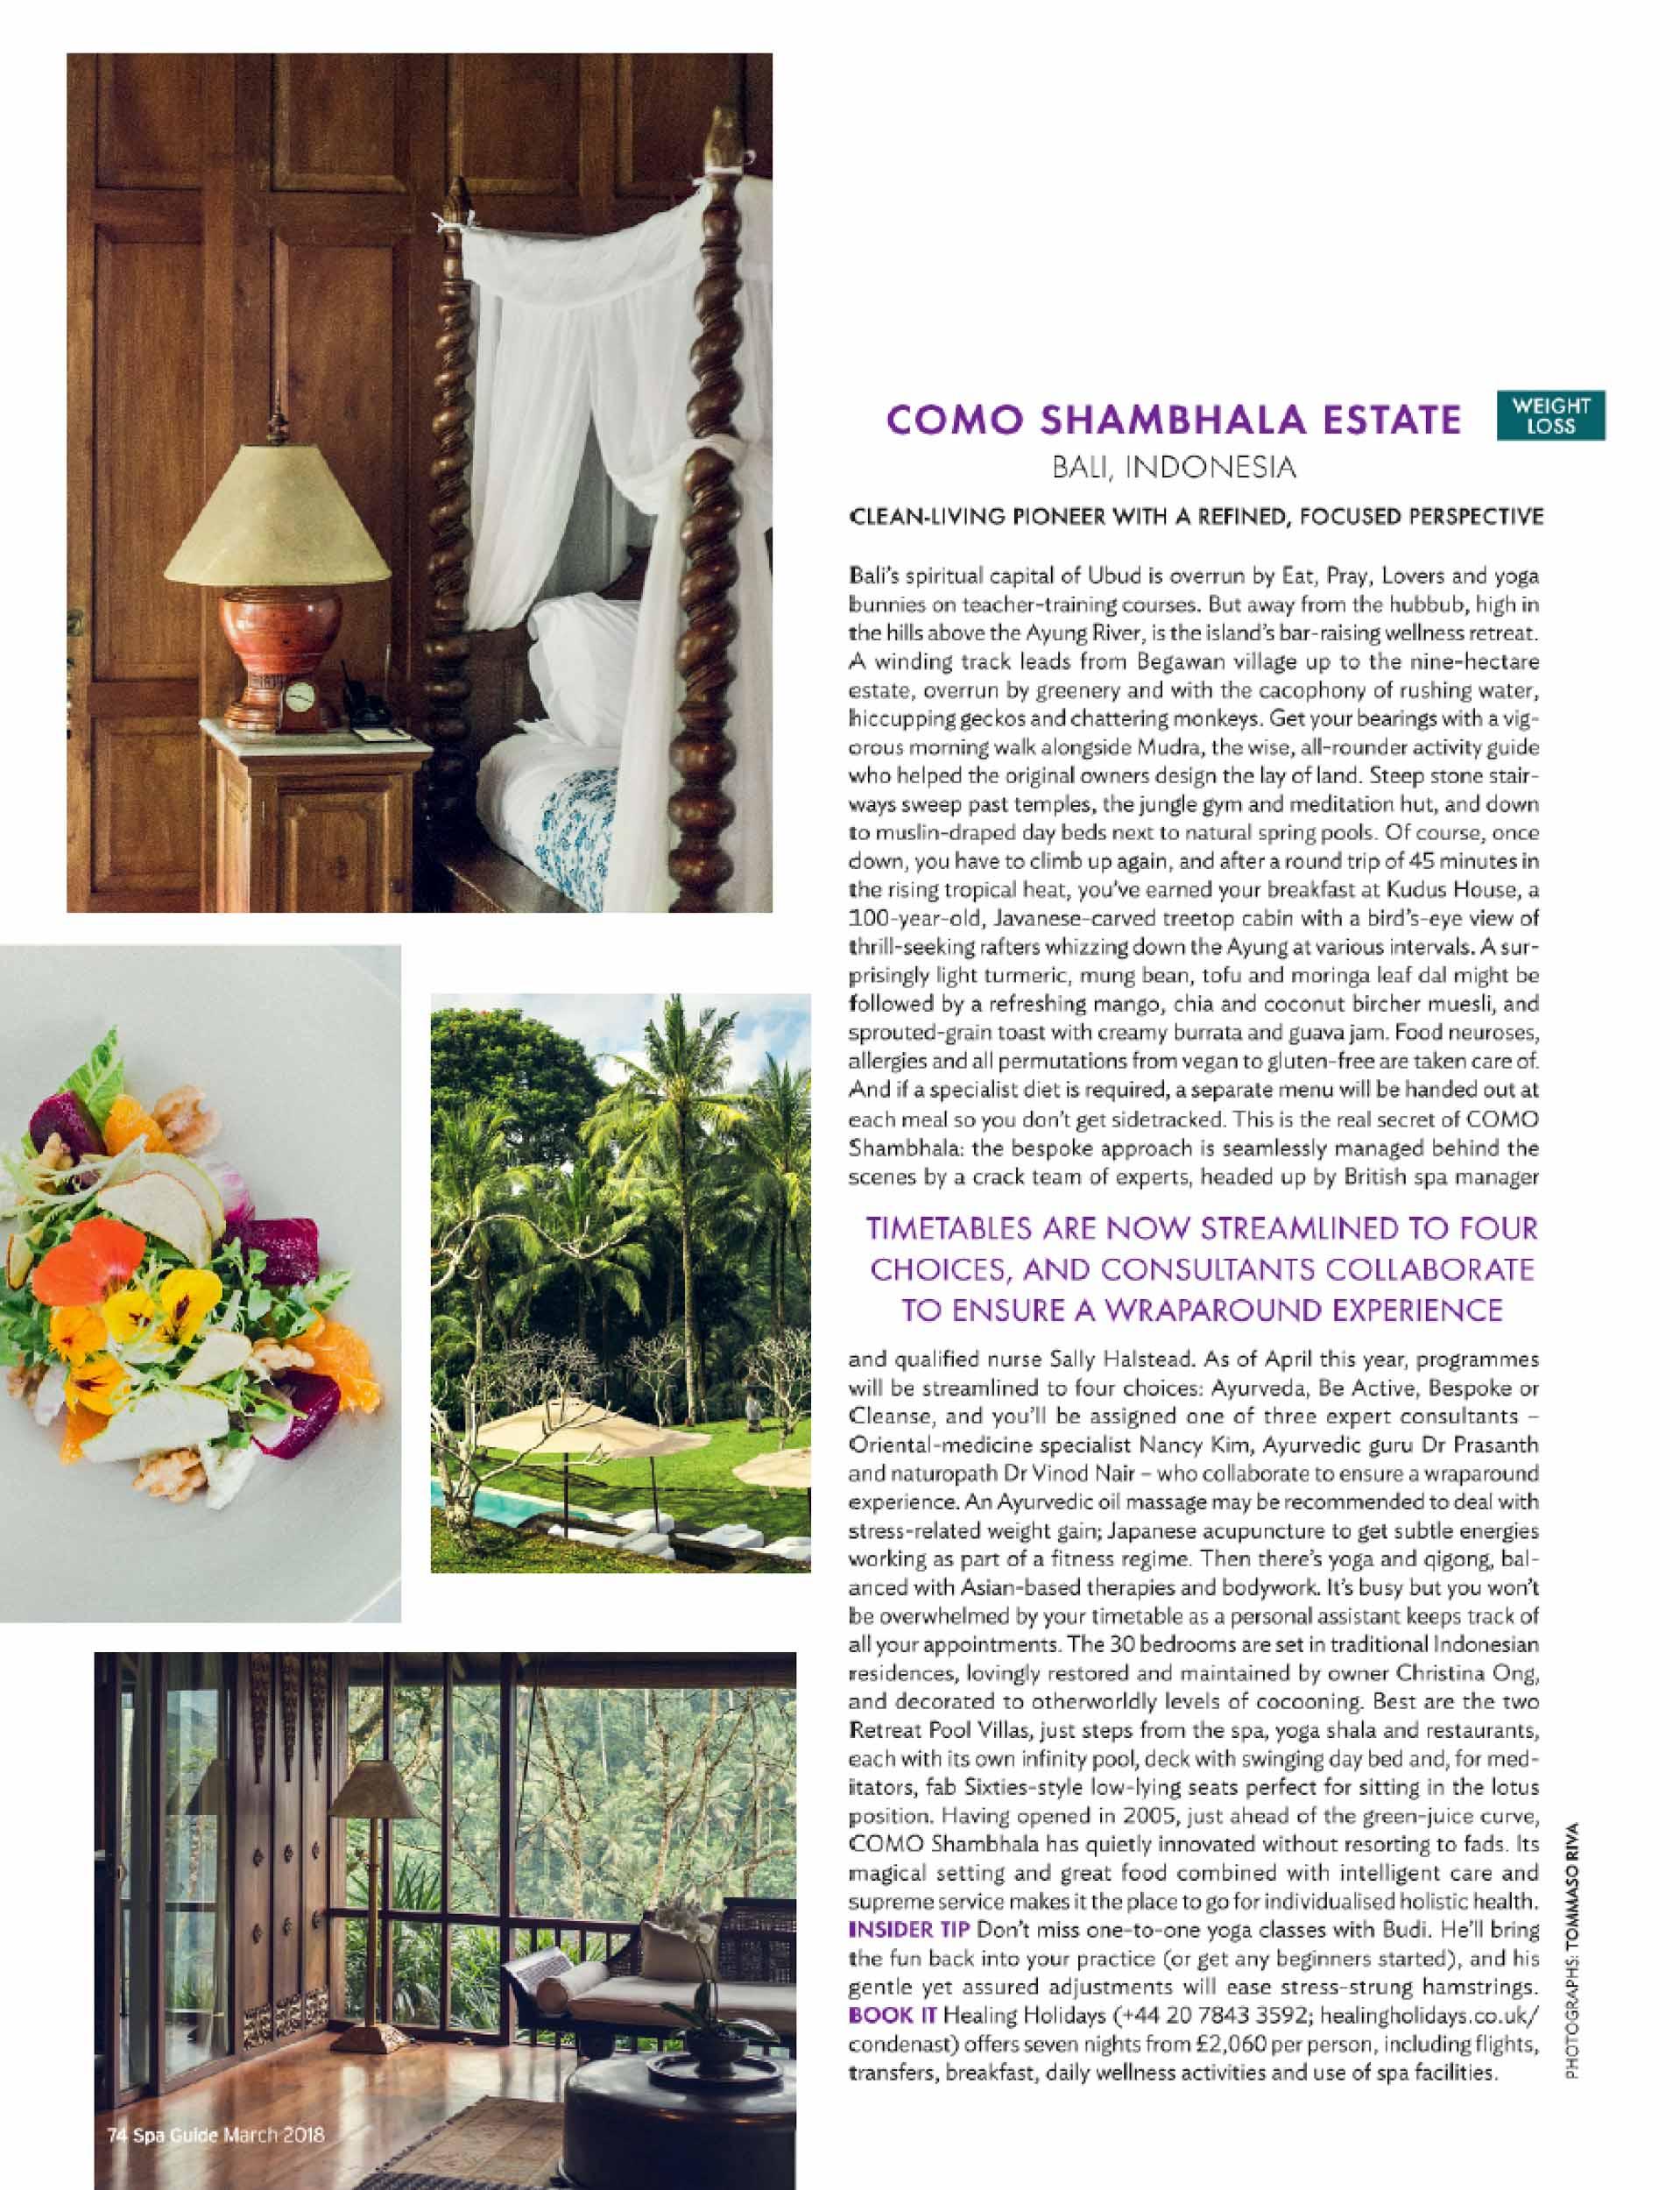 condenast-traveller-como-shambala-spa-guide-tommaso-riva-bali (2 of 2).jpg